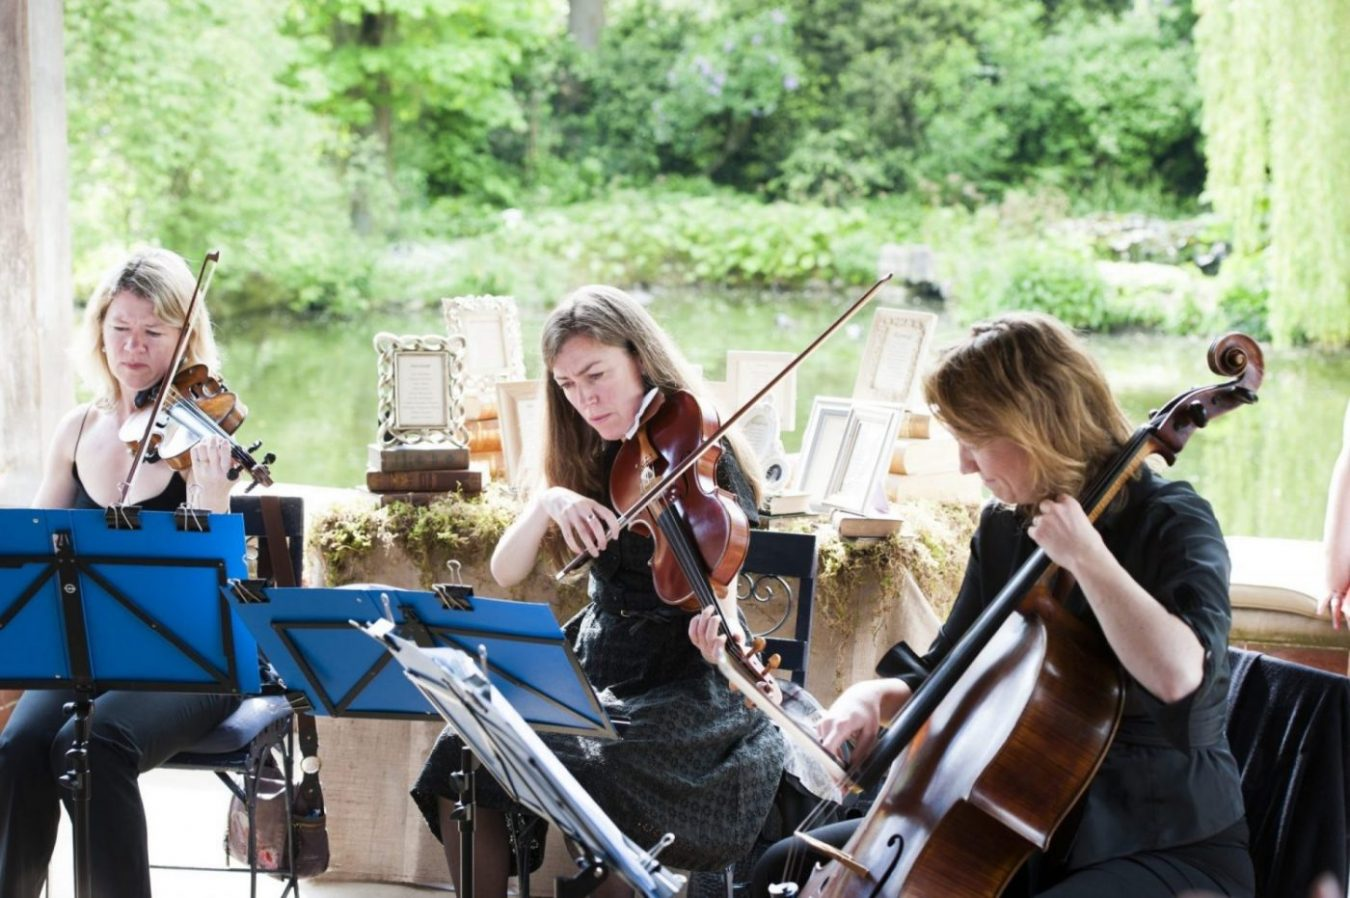 String Quartet at Dairy at Waddesdon Manor